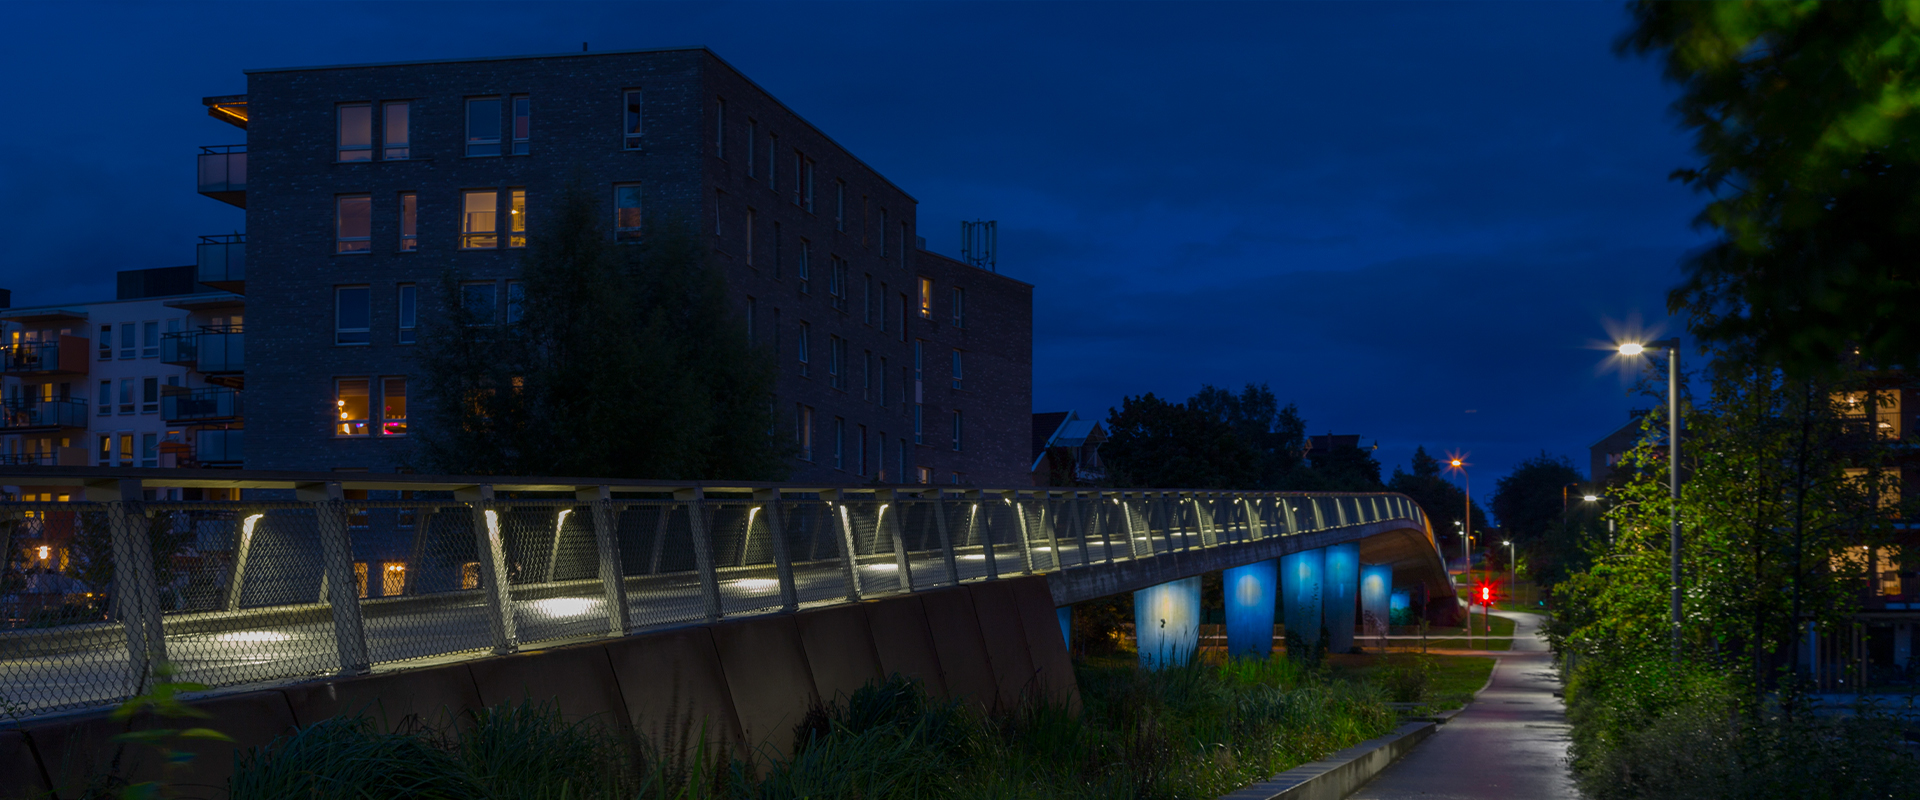 Lampioni LED parchi e giardini pubblici